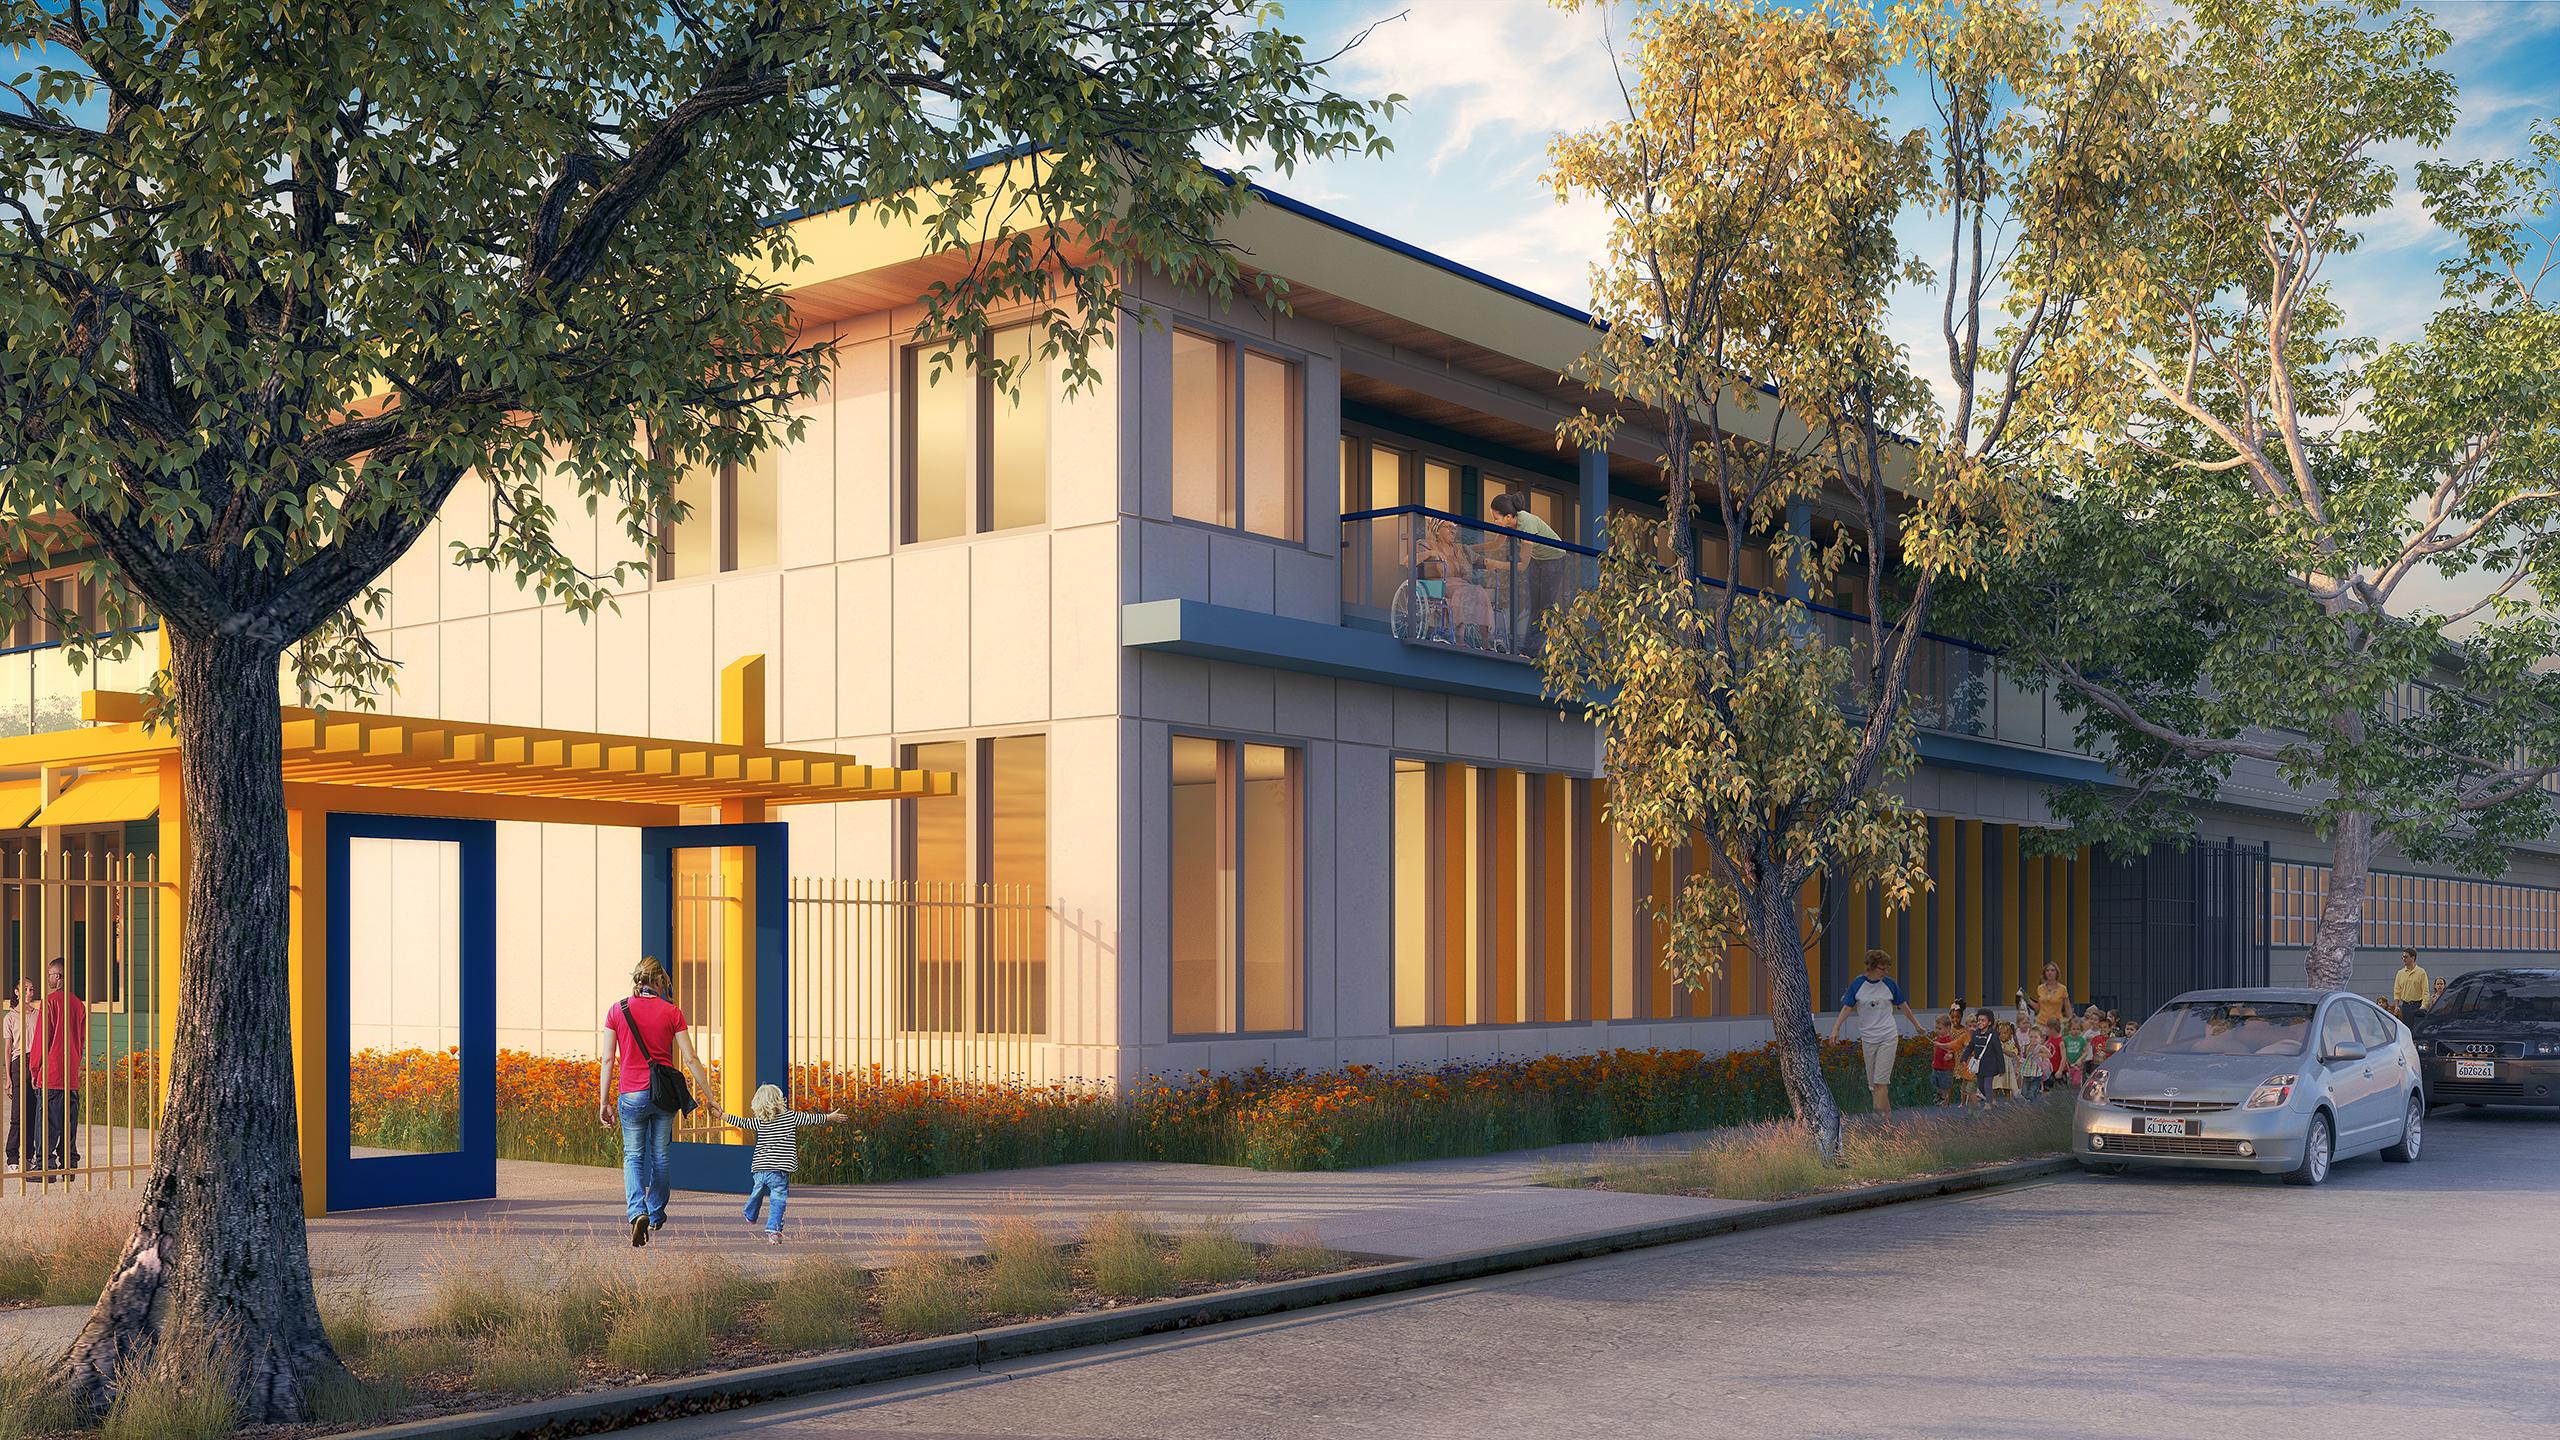 An artist's rendering of the Alameda Wellness Center